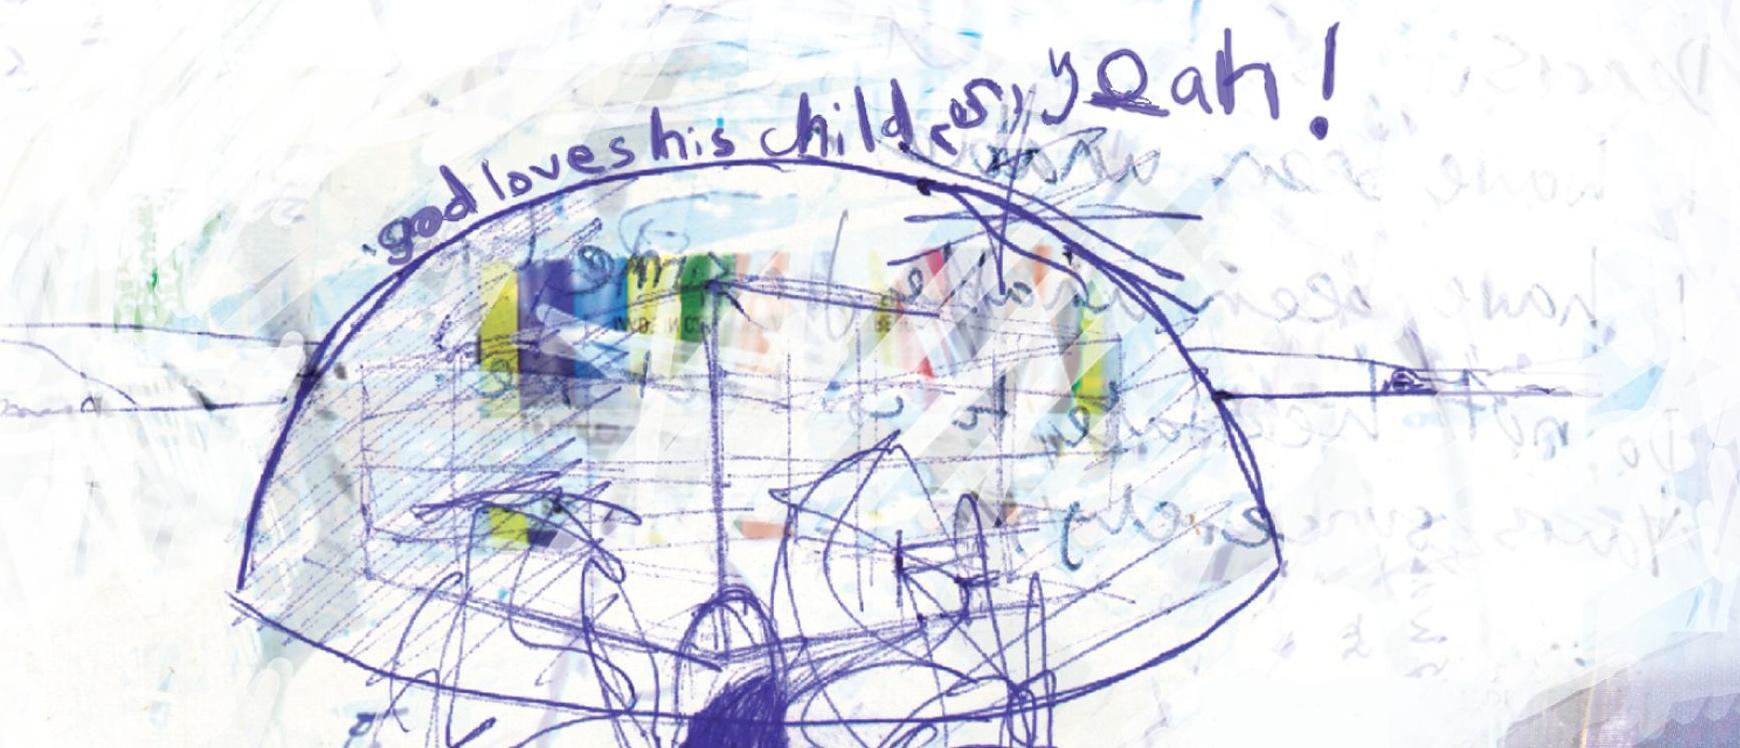 Best Radiohead Tracks - Paranoid Android